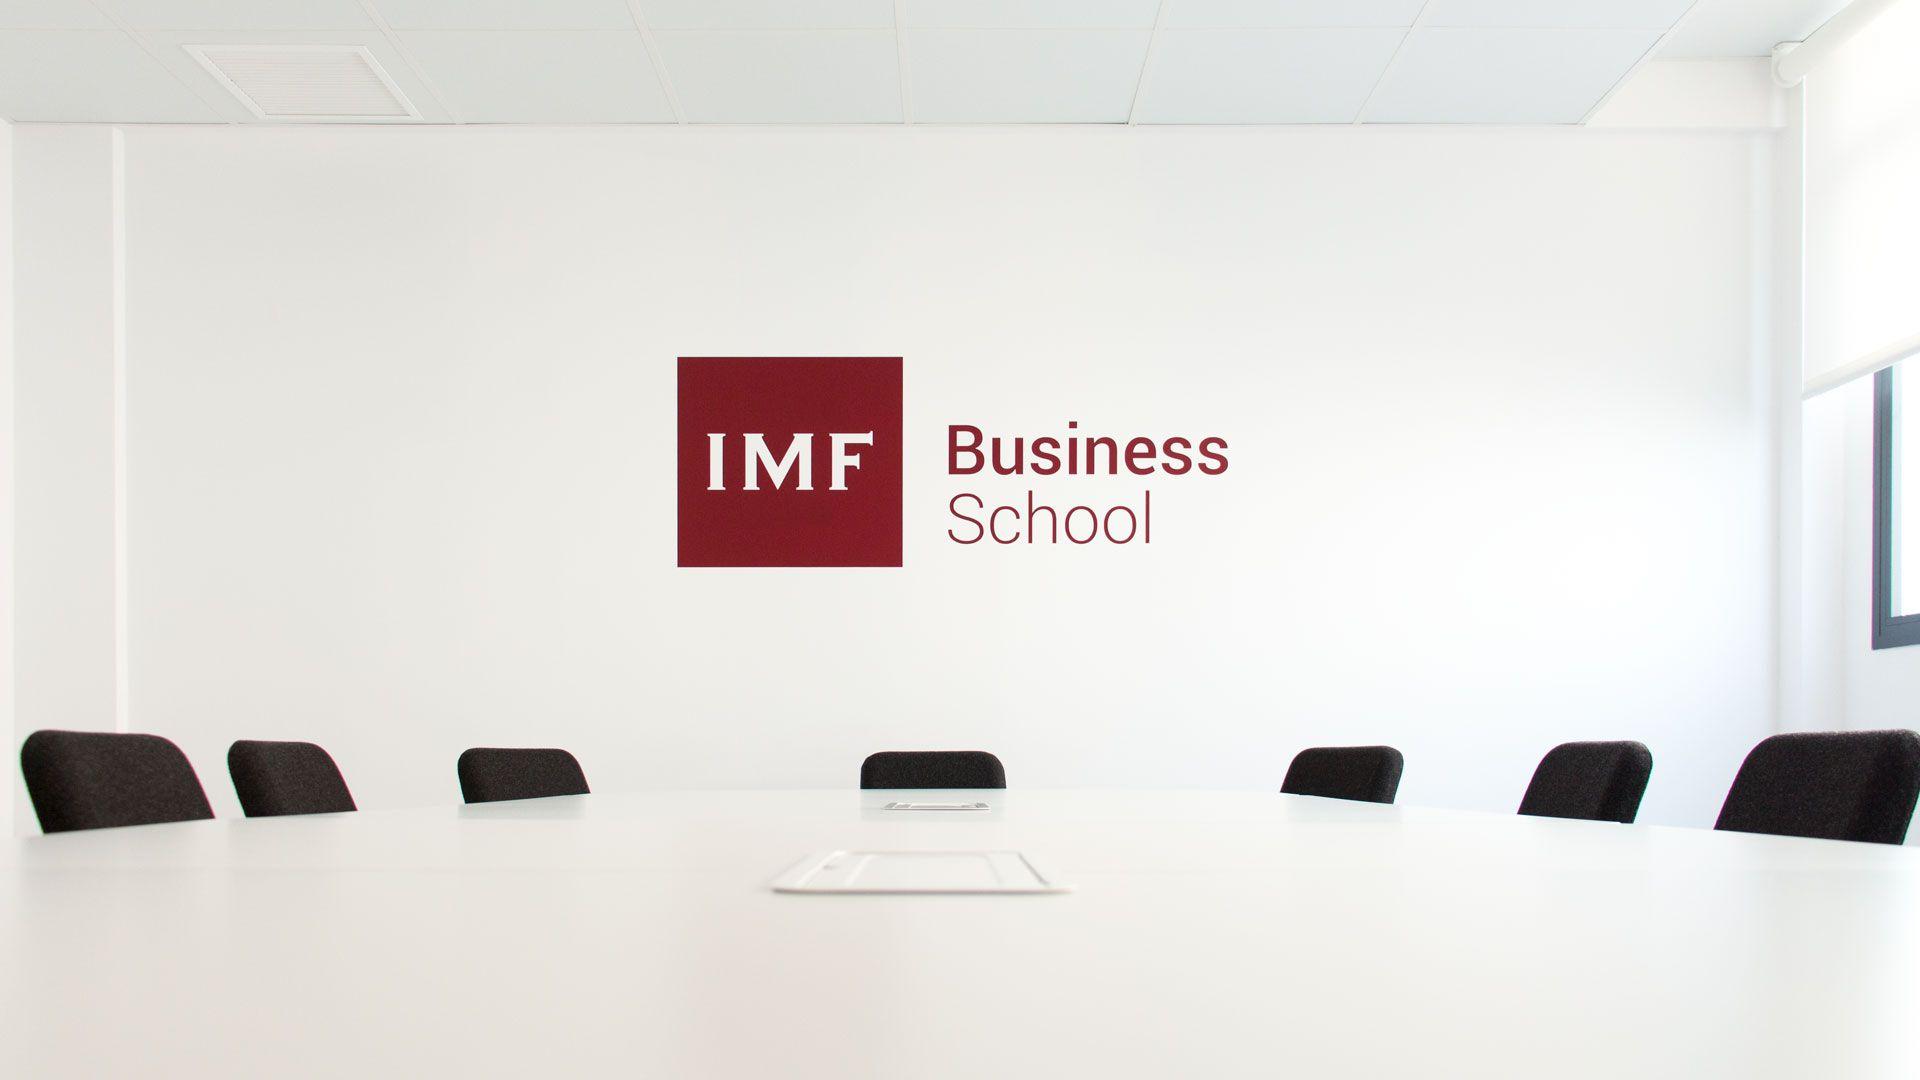 IMF Business School recibe el Sello de Excelencia Europea EFQM 500+